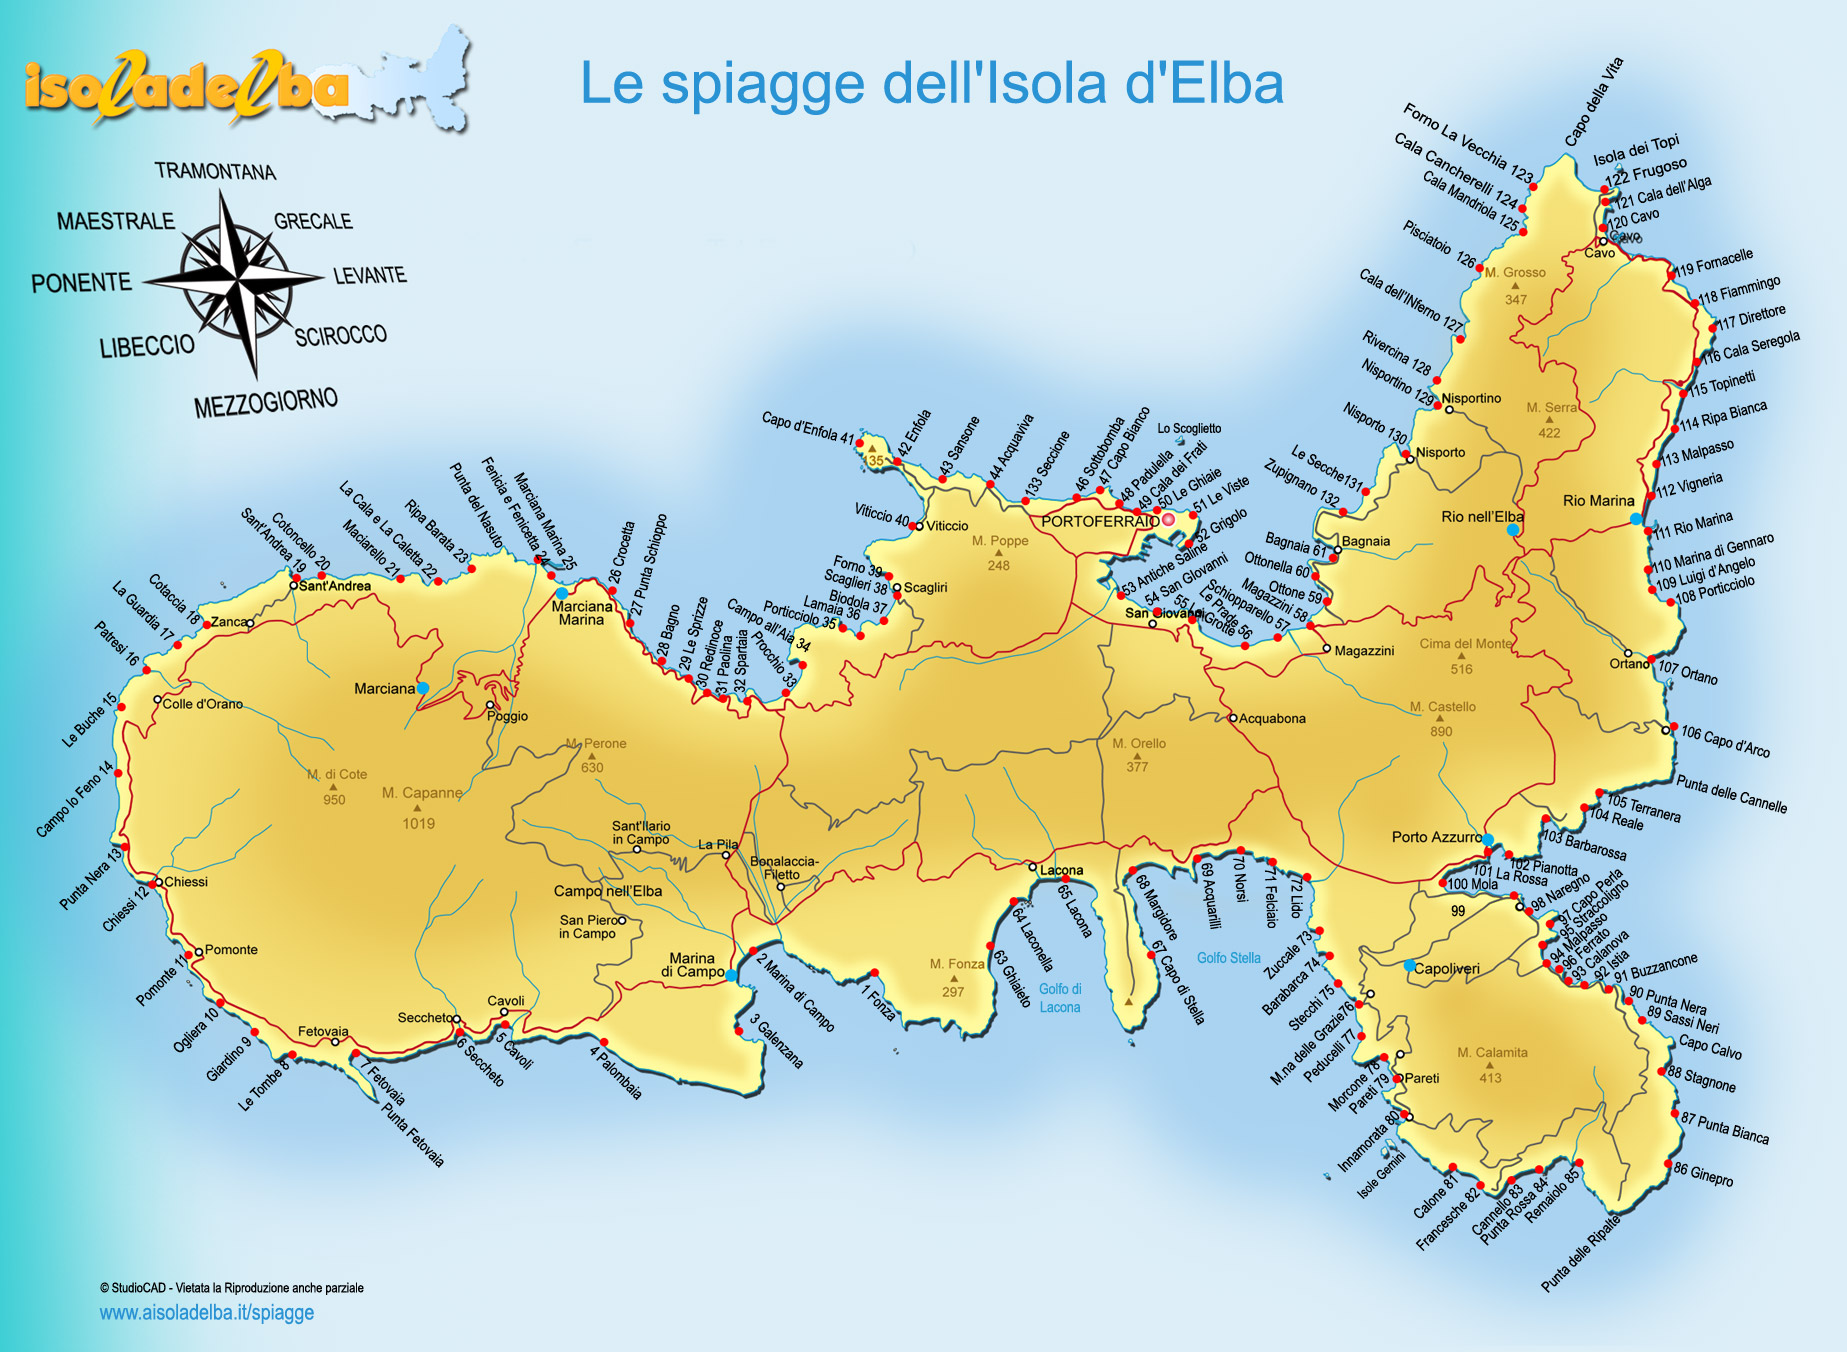 Cartina Elba Isola.Cartina E Mappa Dell Isola D Elba